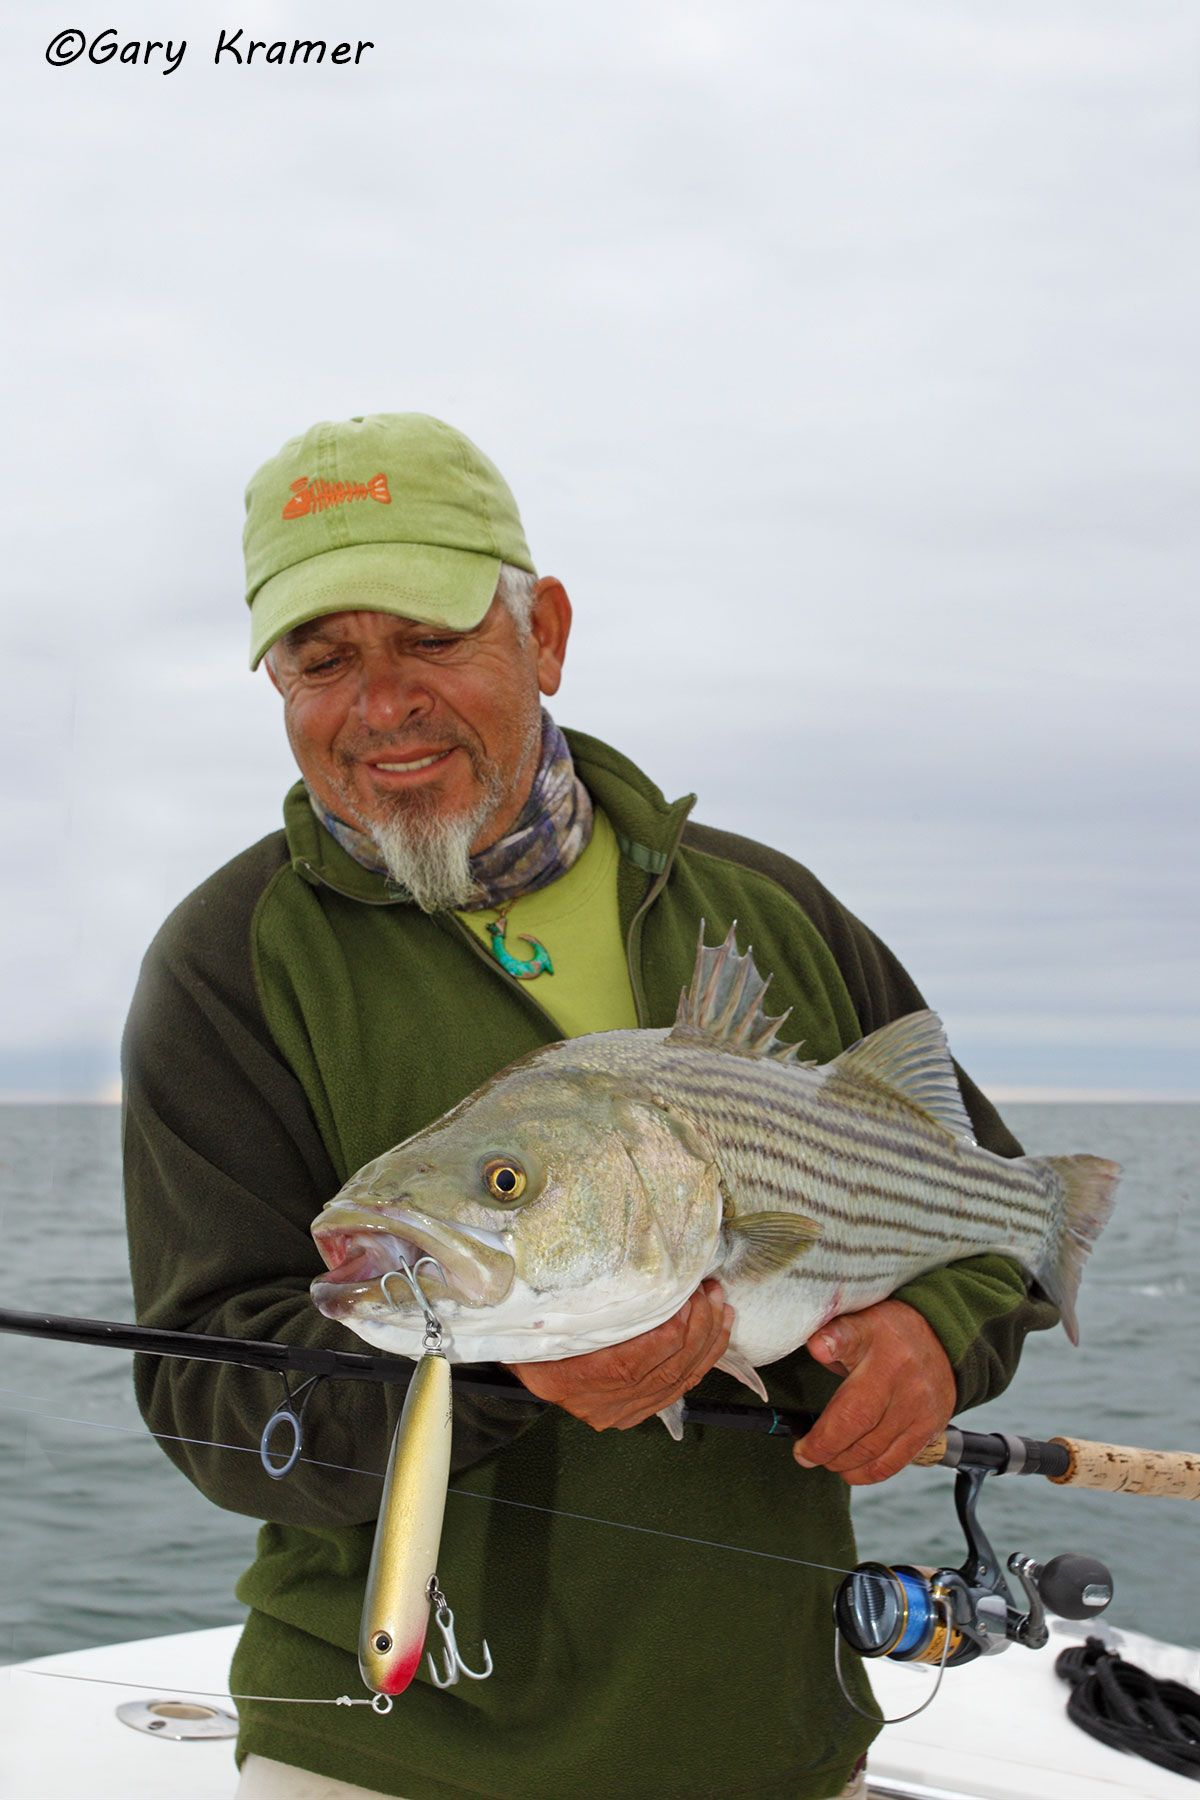 Angler (Tom Cornicelli) w/Striped Bass - NFSb#015d